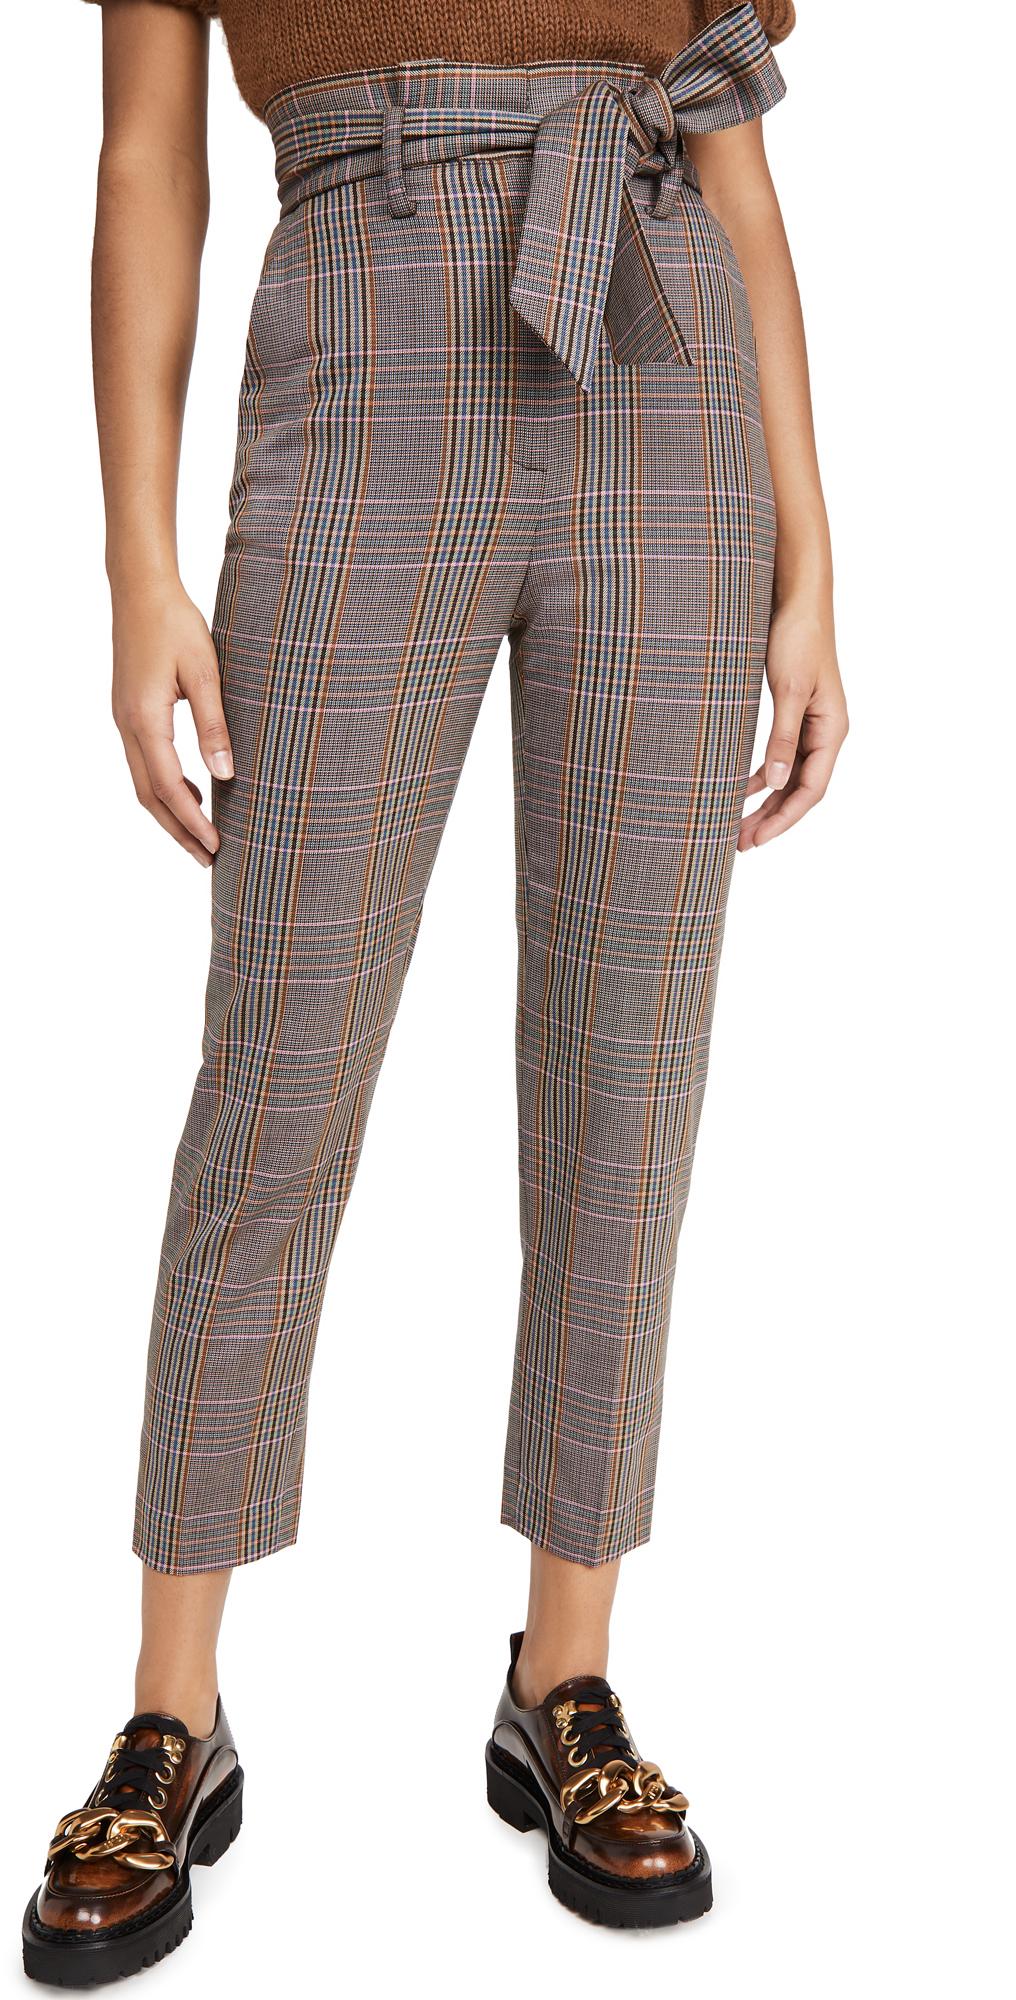 Veronica Beard Clerence Pants